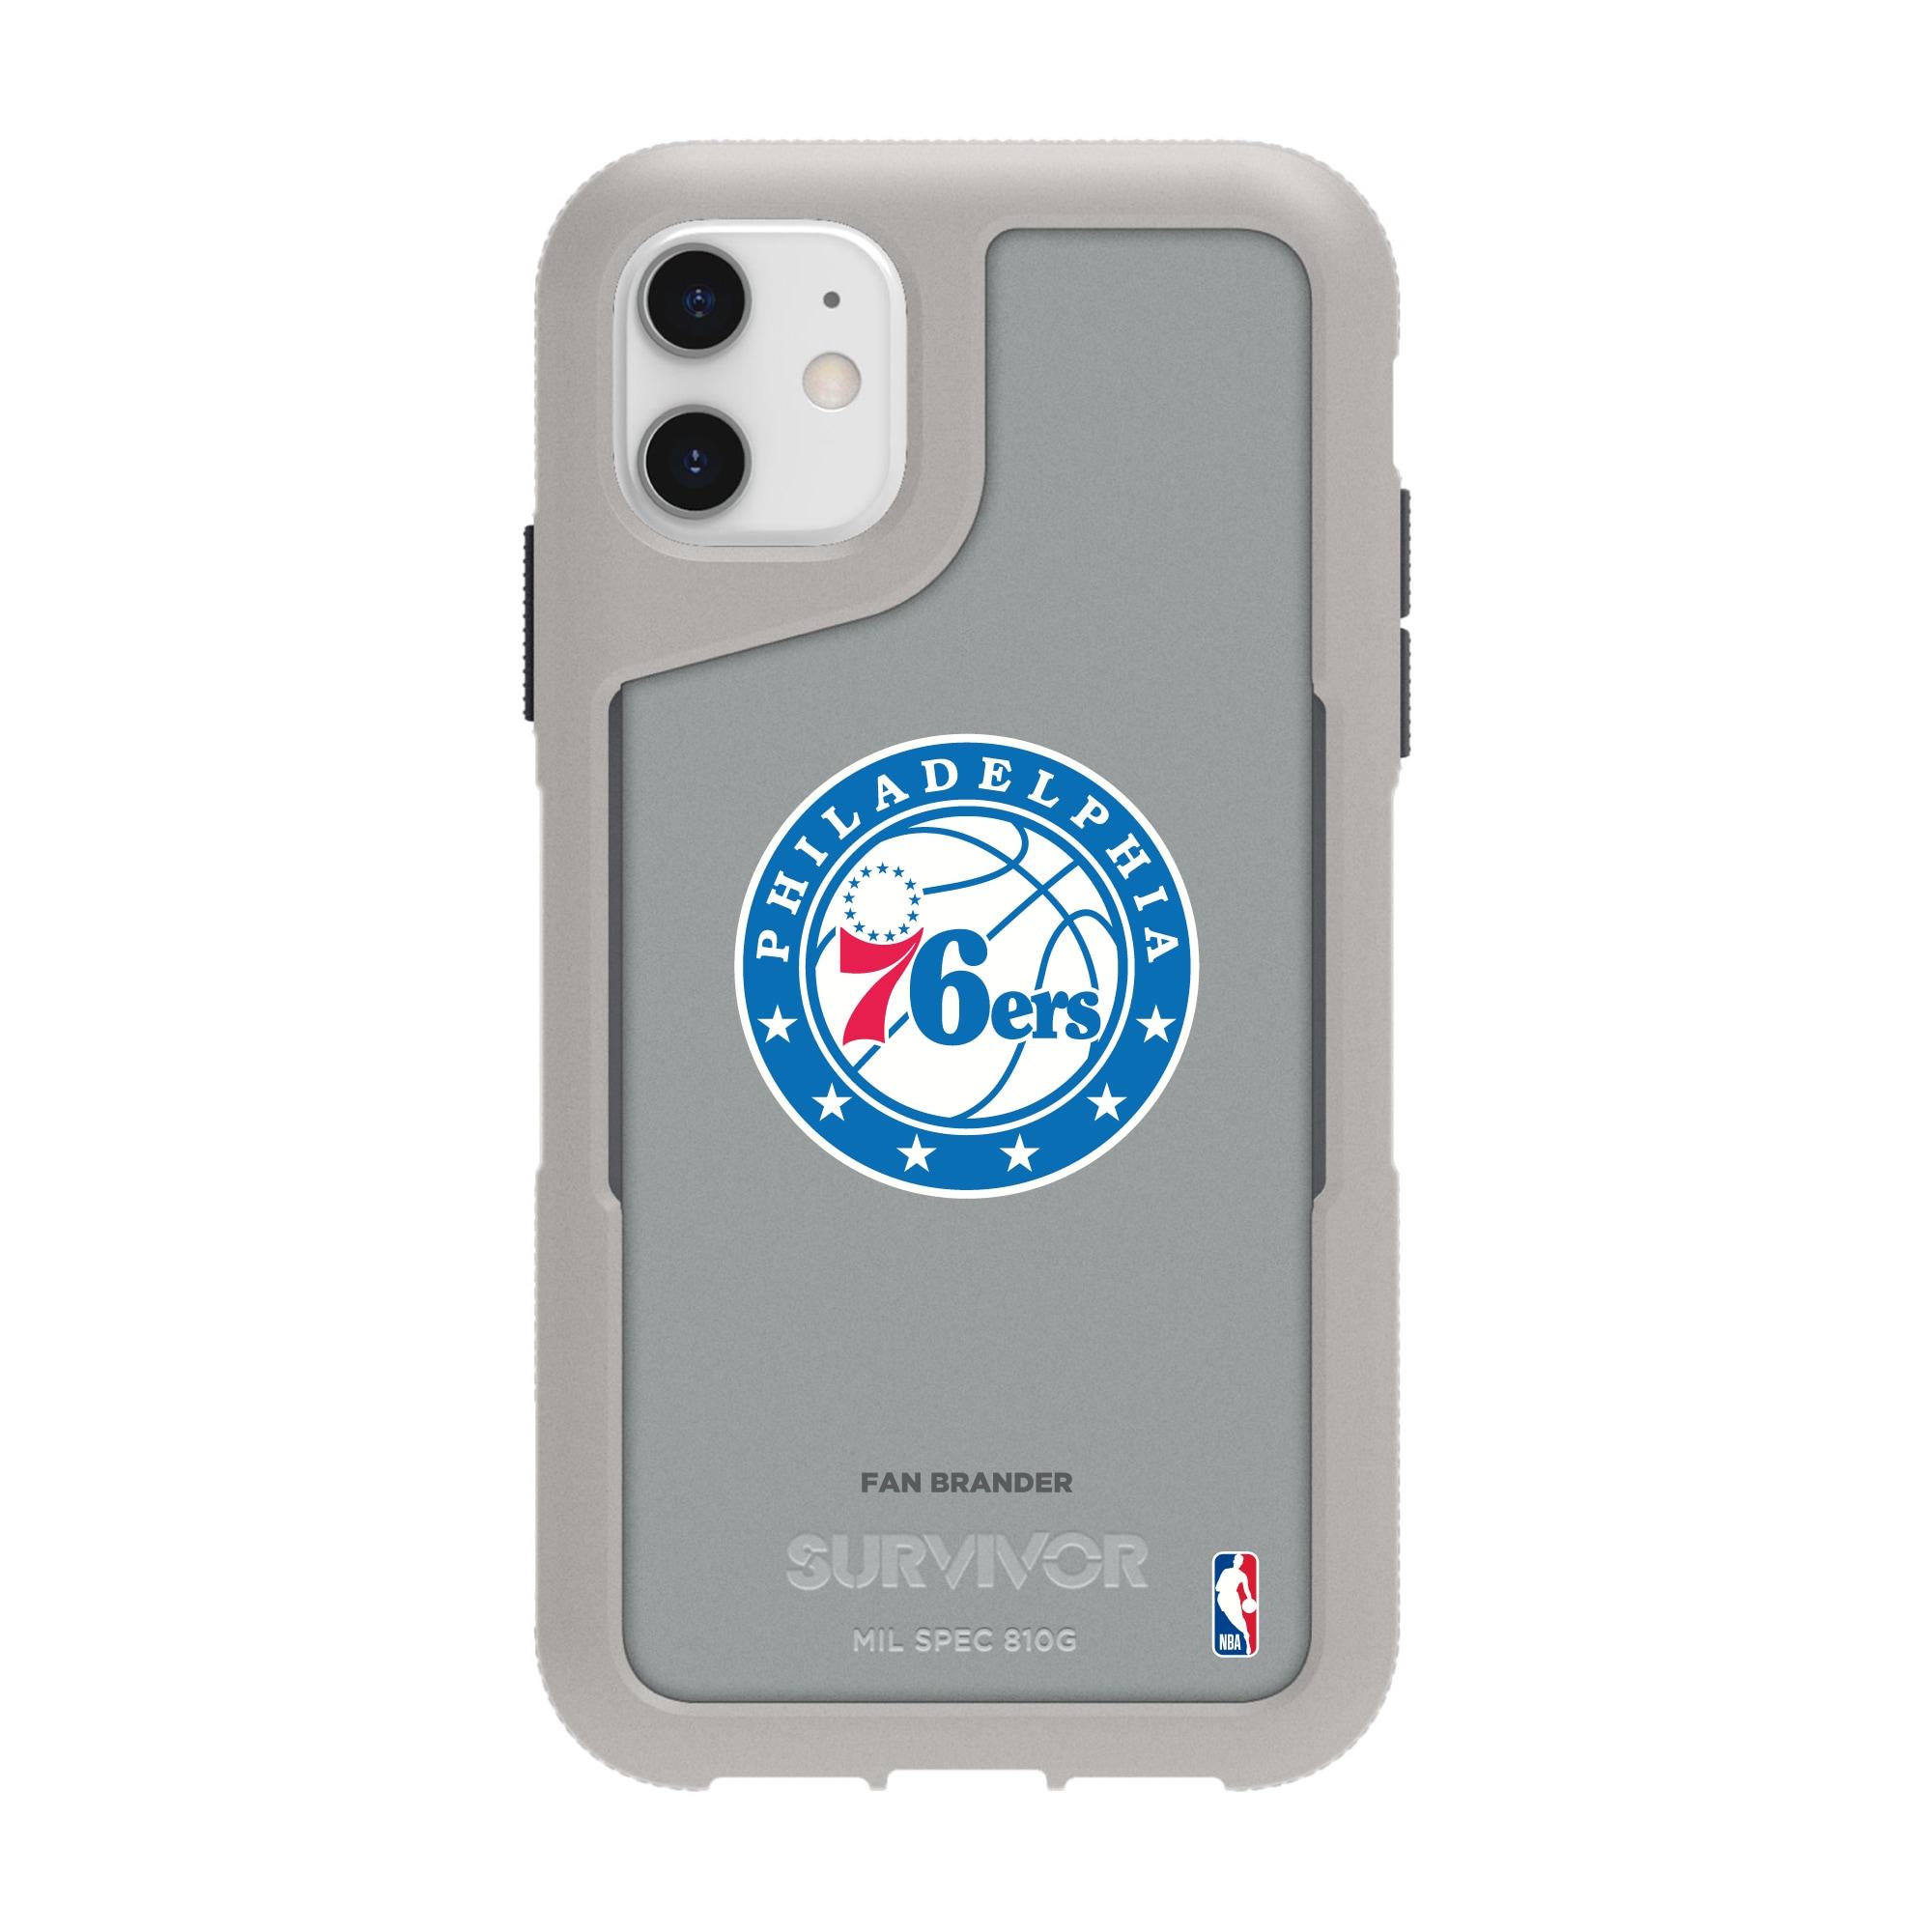 Philadelphia 76ers Griffin Survivor Endurance iPhone Case - Gray